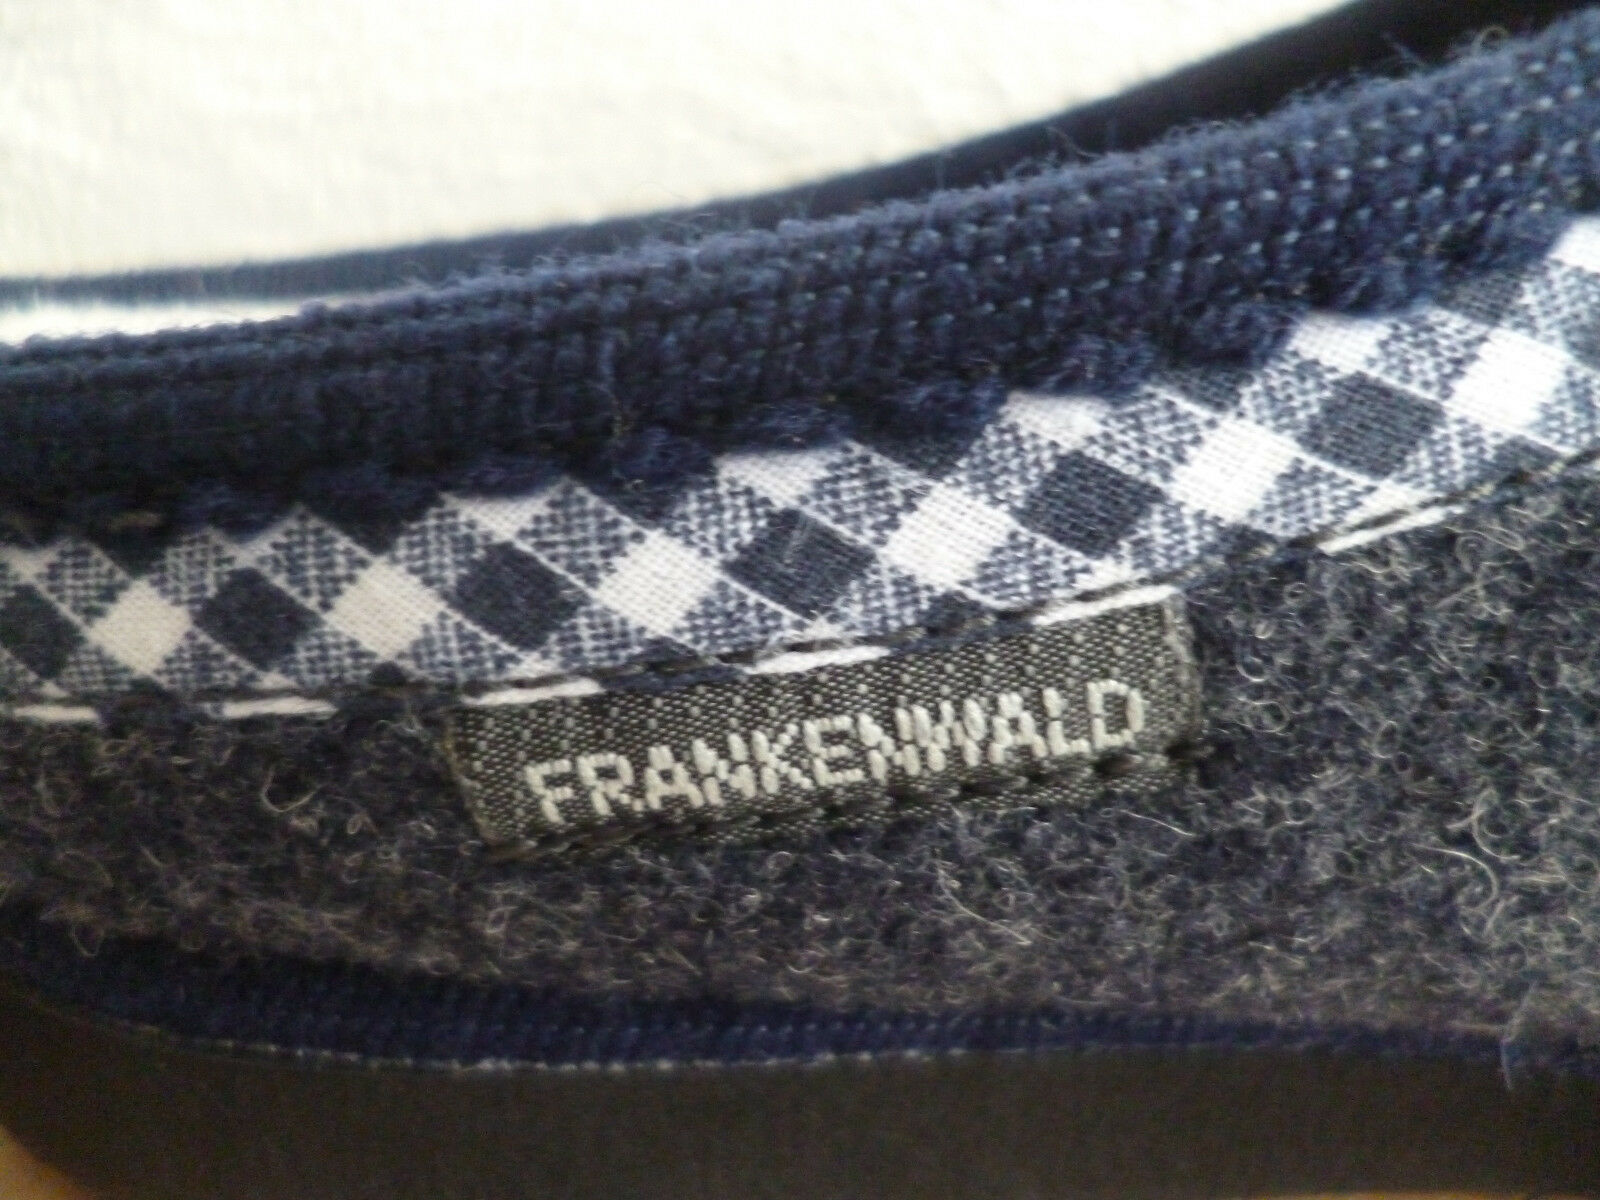 Frankenwald Damen Pantoffel Hausschuhe, blau/grau NEU für lose Einlagen, Filz NEU blau/grau 49b0a1